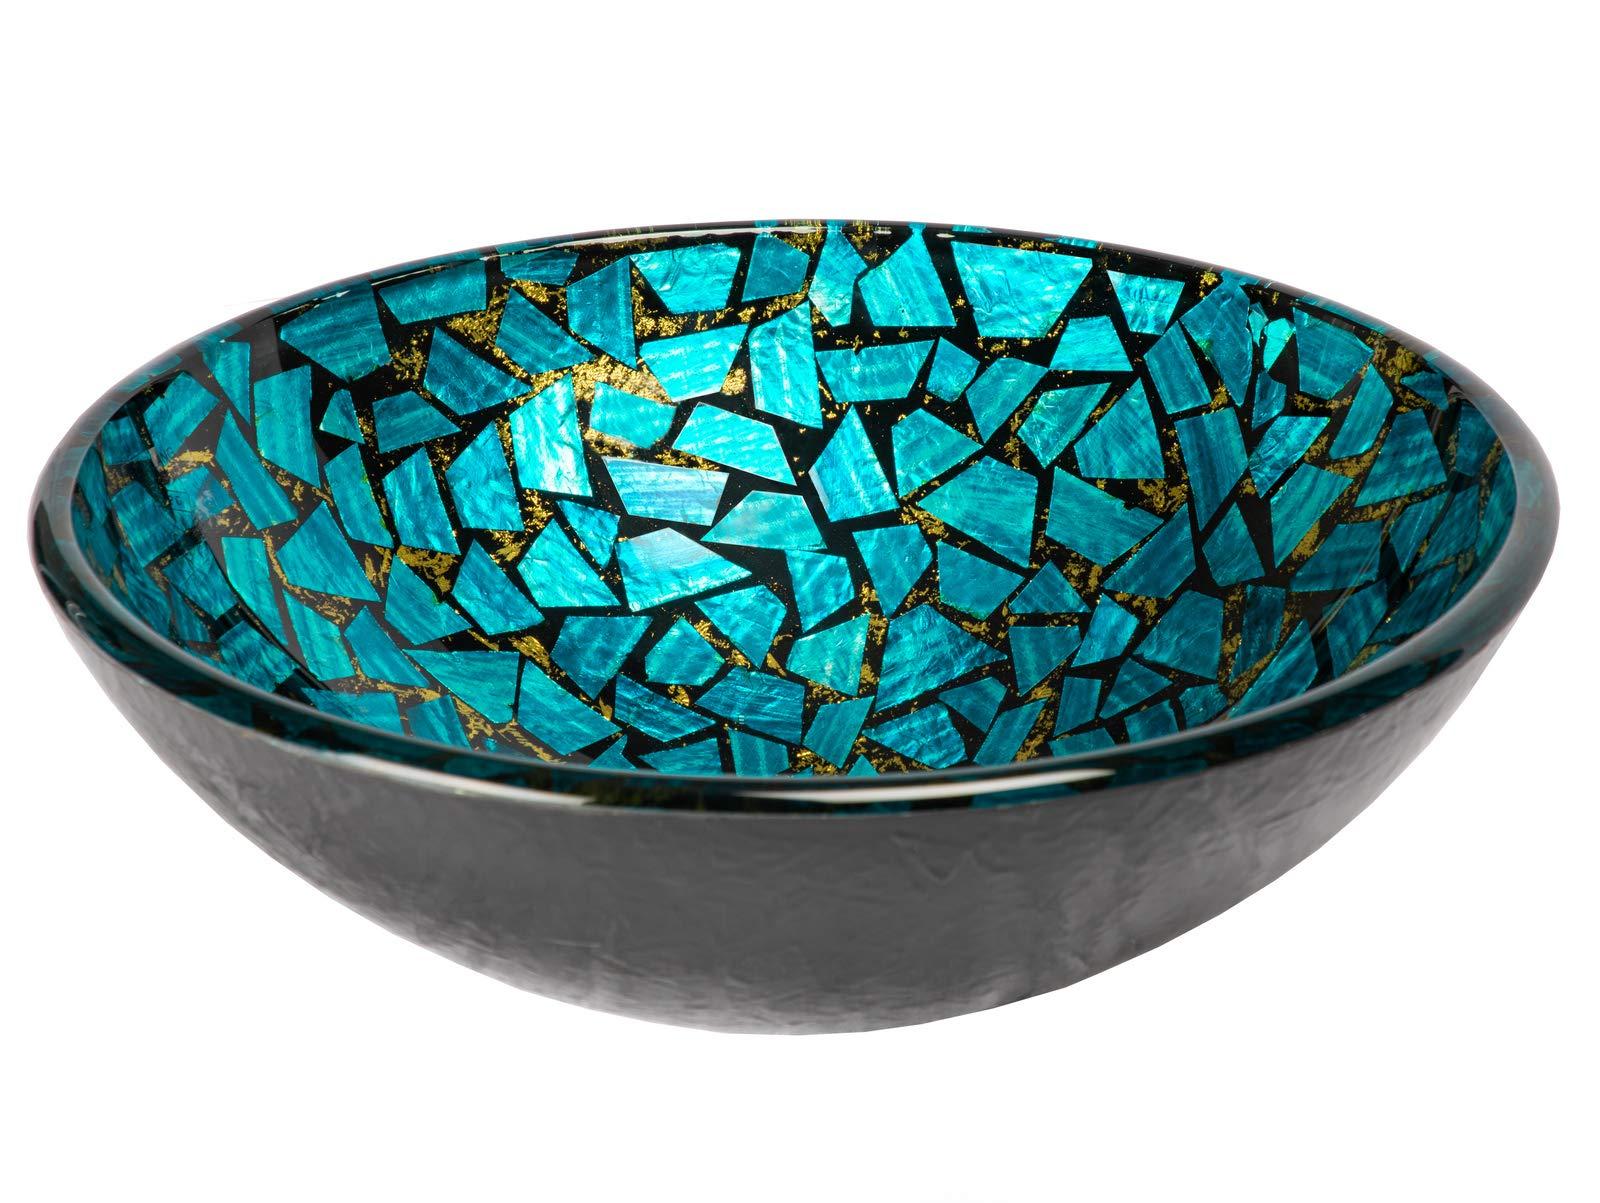 Eden Bath Blue And Gold Mosaic Round Glass Bathroom Vessel Sink Amazon Com